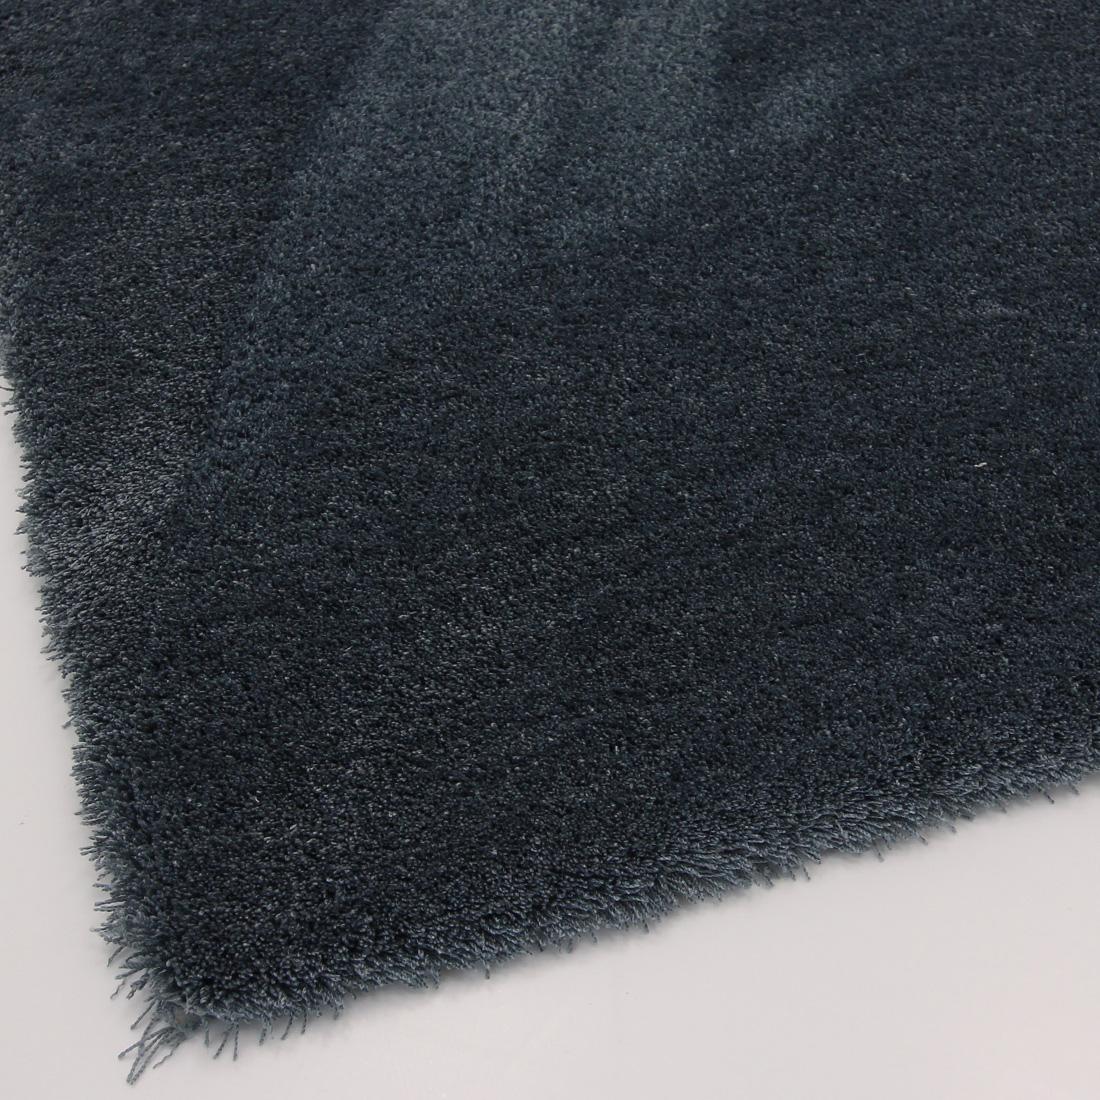 Vloerkleed Xilento Silky Soft Wave | 200 x 300 cm